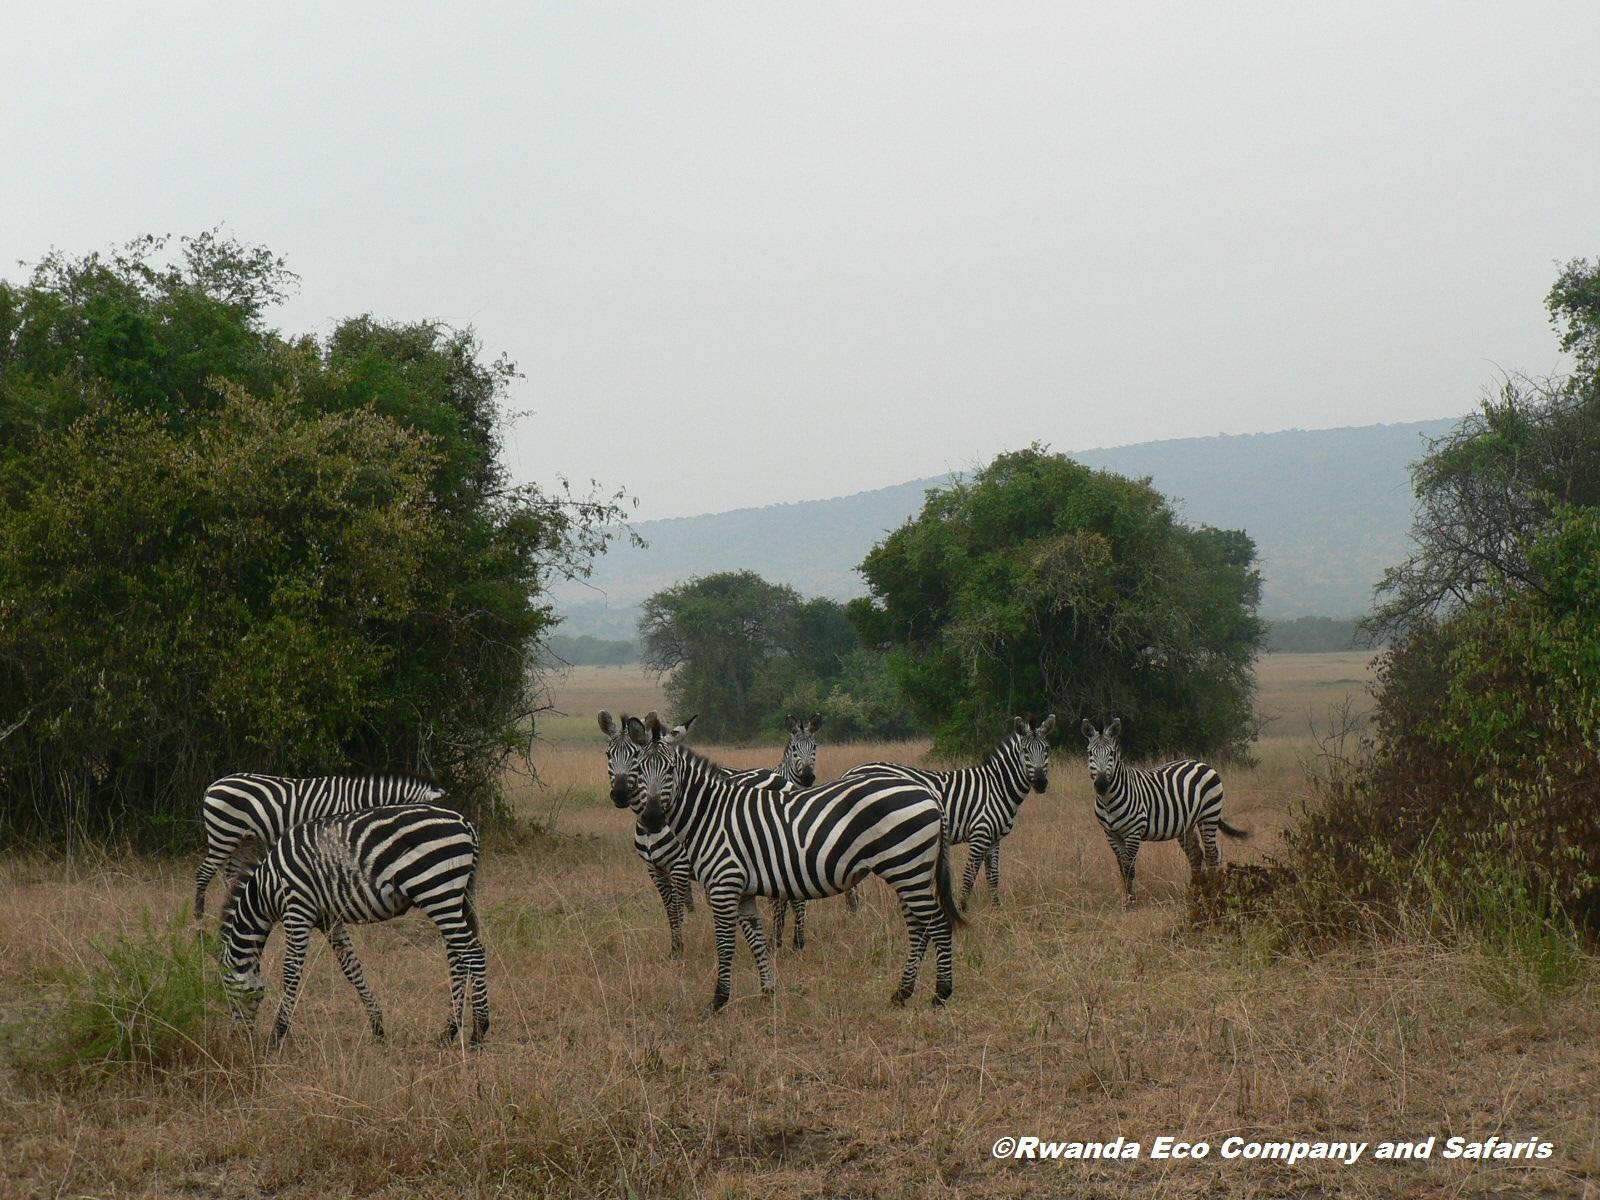 1 Day Lake Mburo National Park Tour